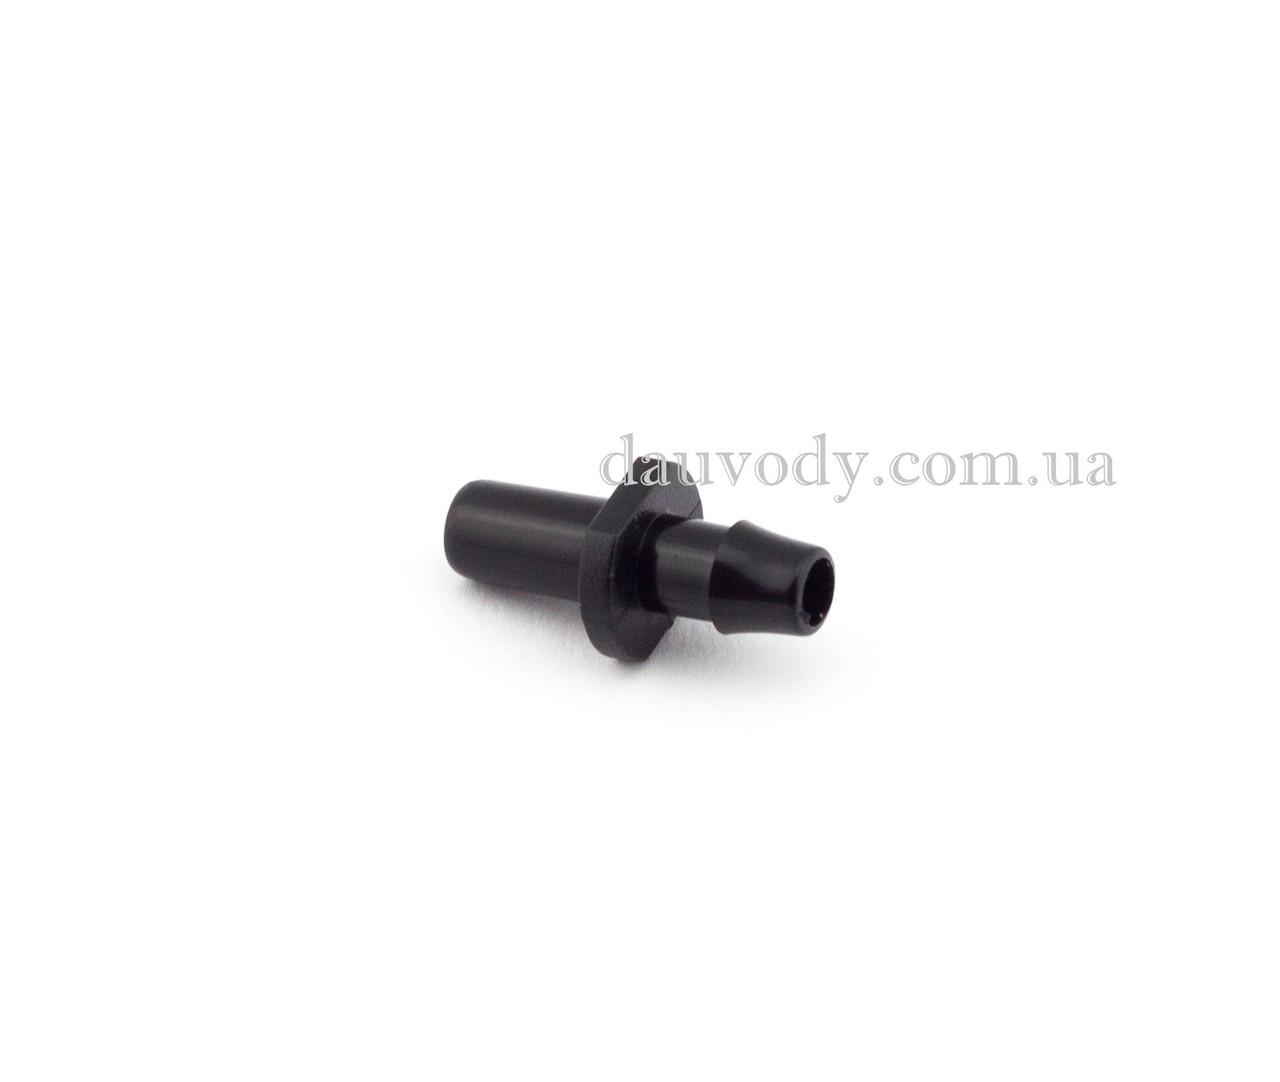 Адаптер для трубки 5,0 мм (раздаточной)